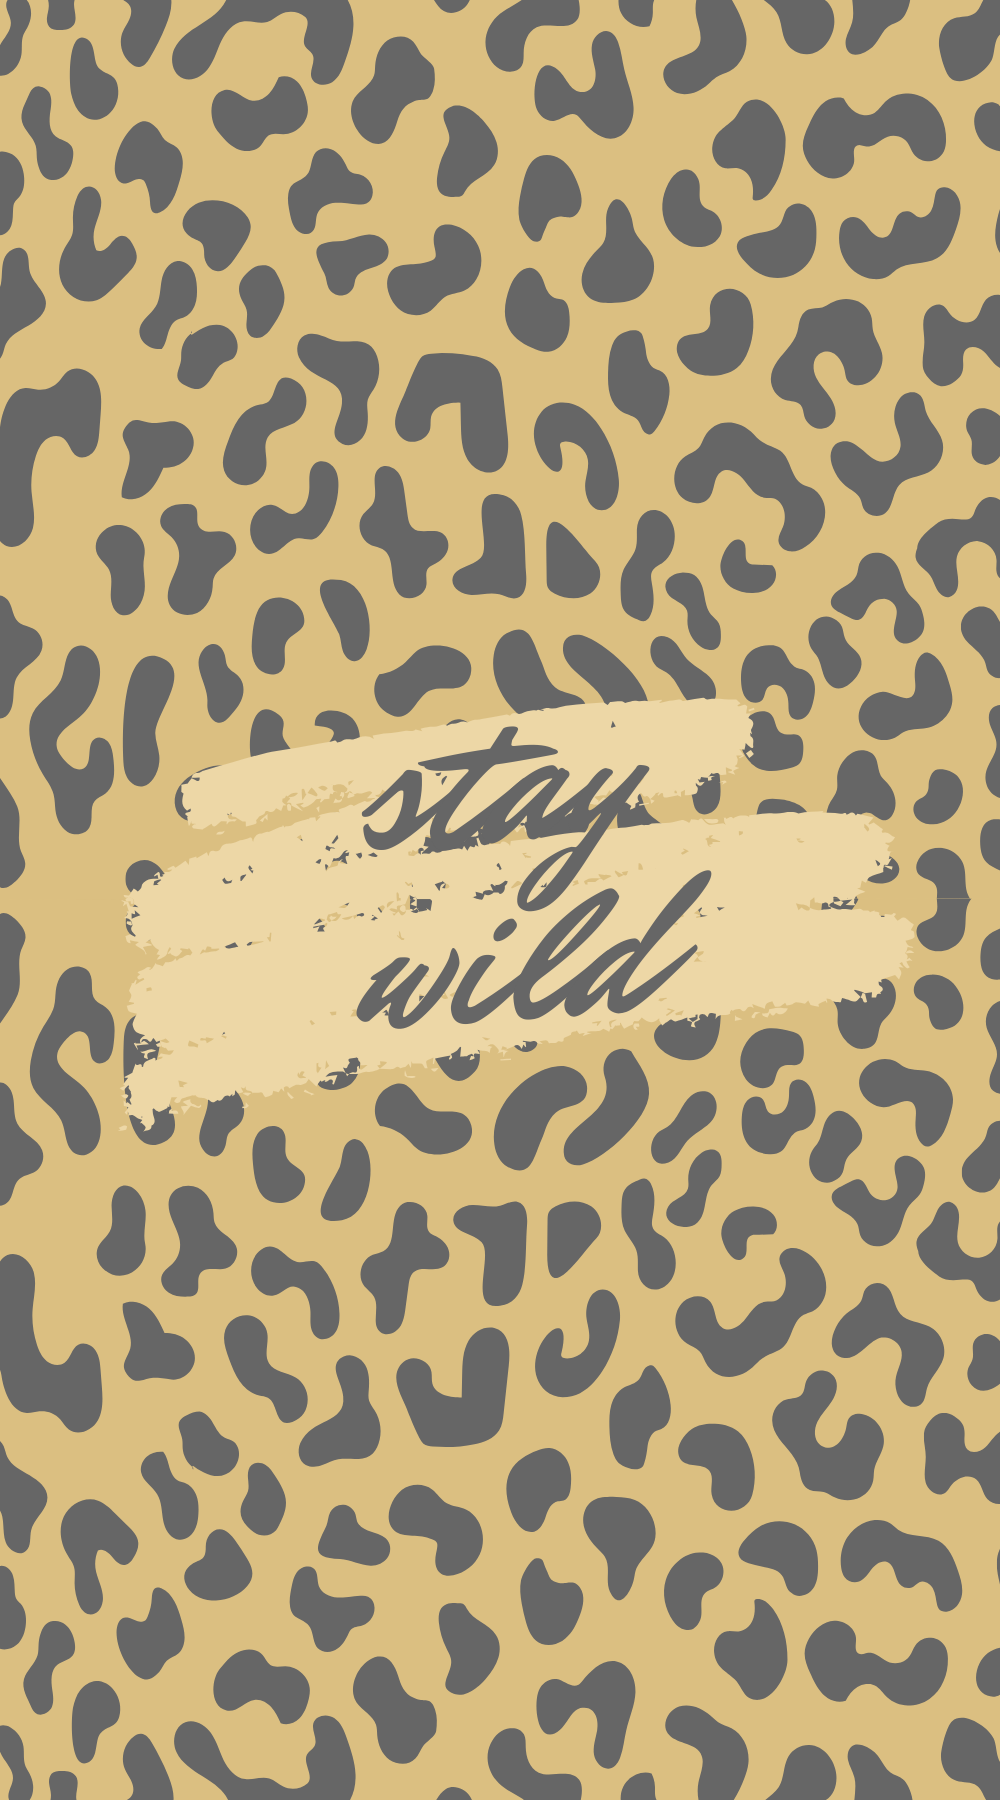 Cute Iphone Wallpaper And Backgrounds Ballen Blogger Cheetah Print Background Cheetah Print Wallpaper Leopard Print Wallpaper